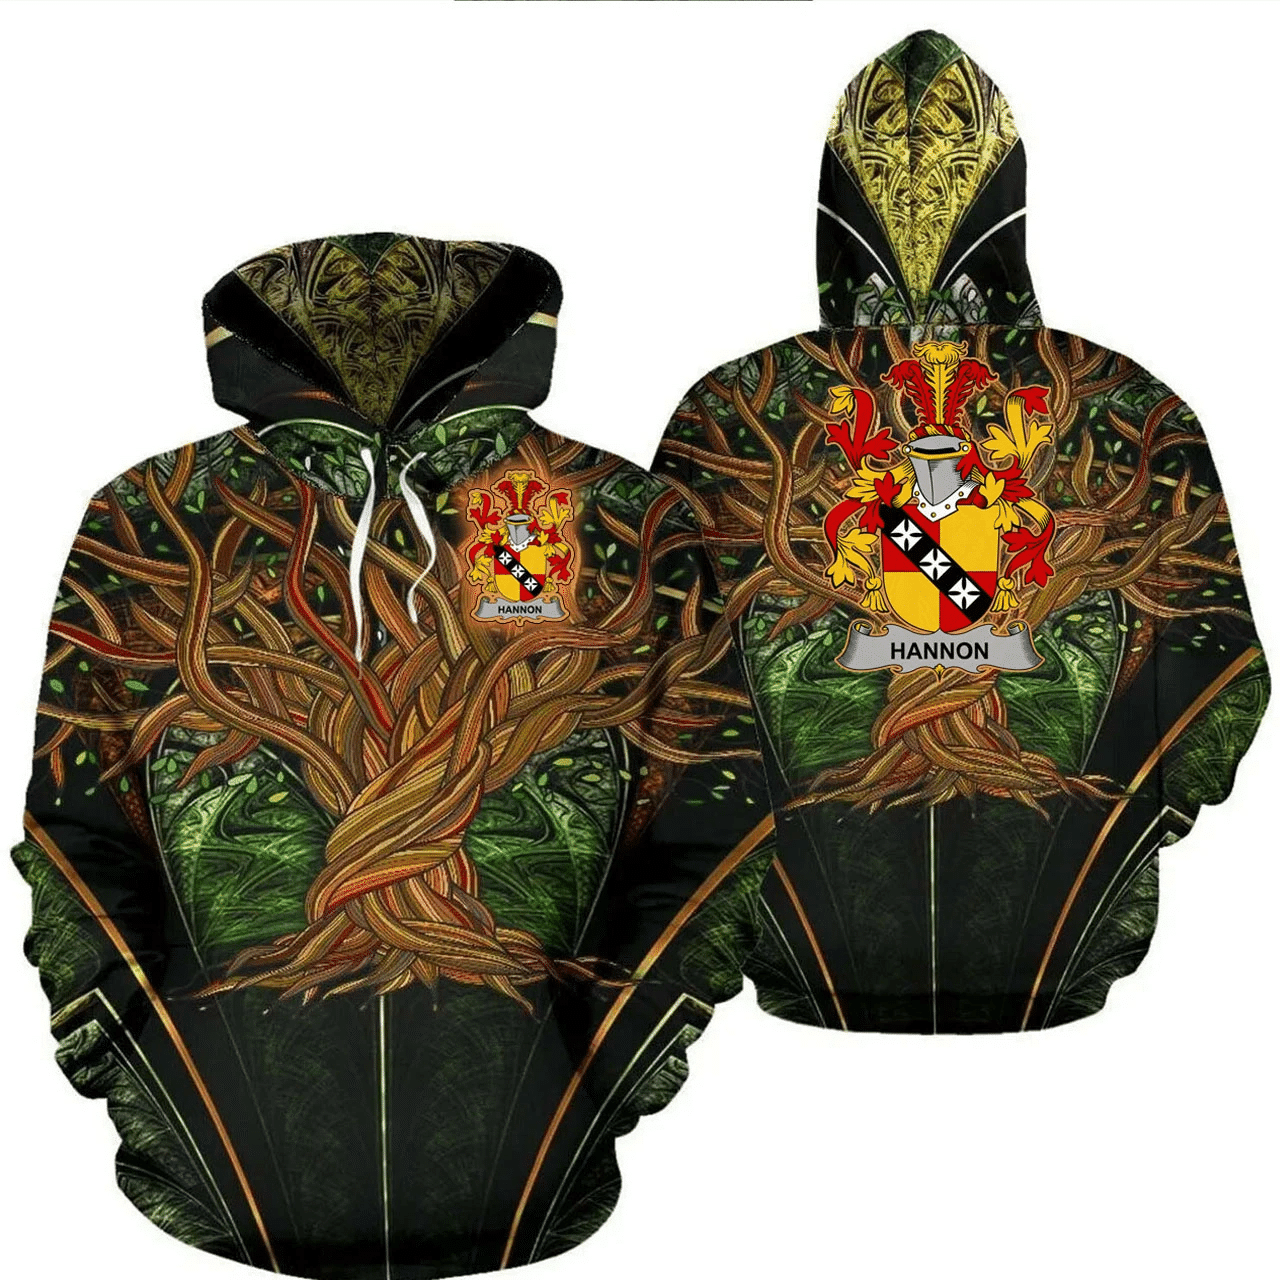 1stIreland Ireland Hoodie - Hannon or O'Hannon Irish Family Crest Hoodie - Tree Of Life A7